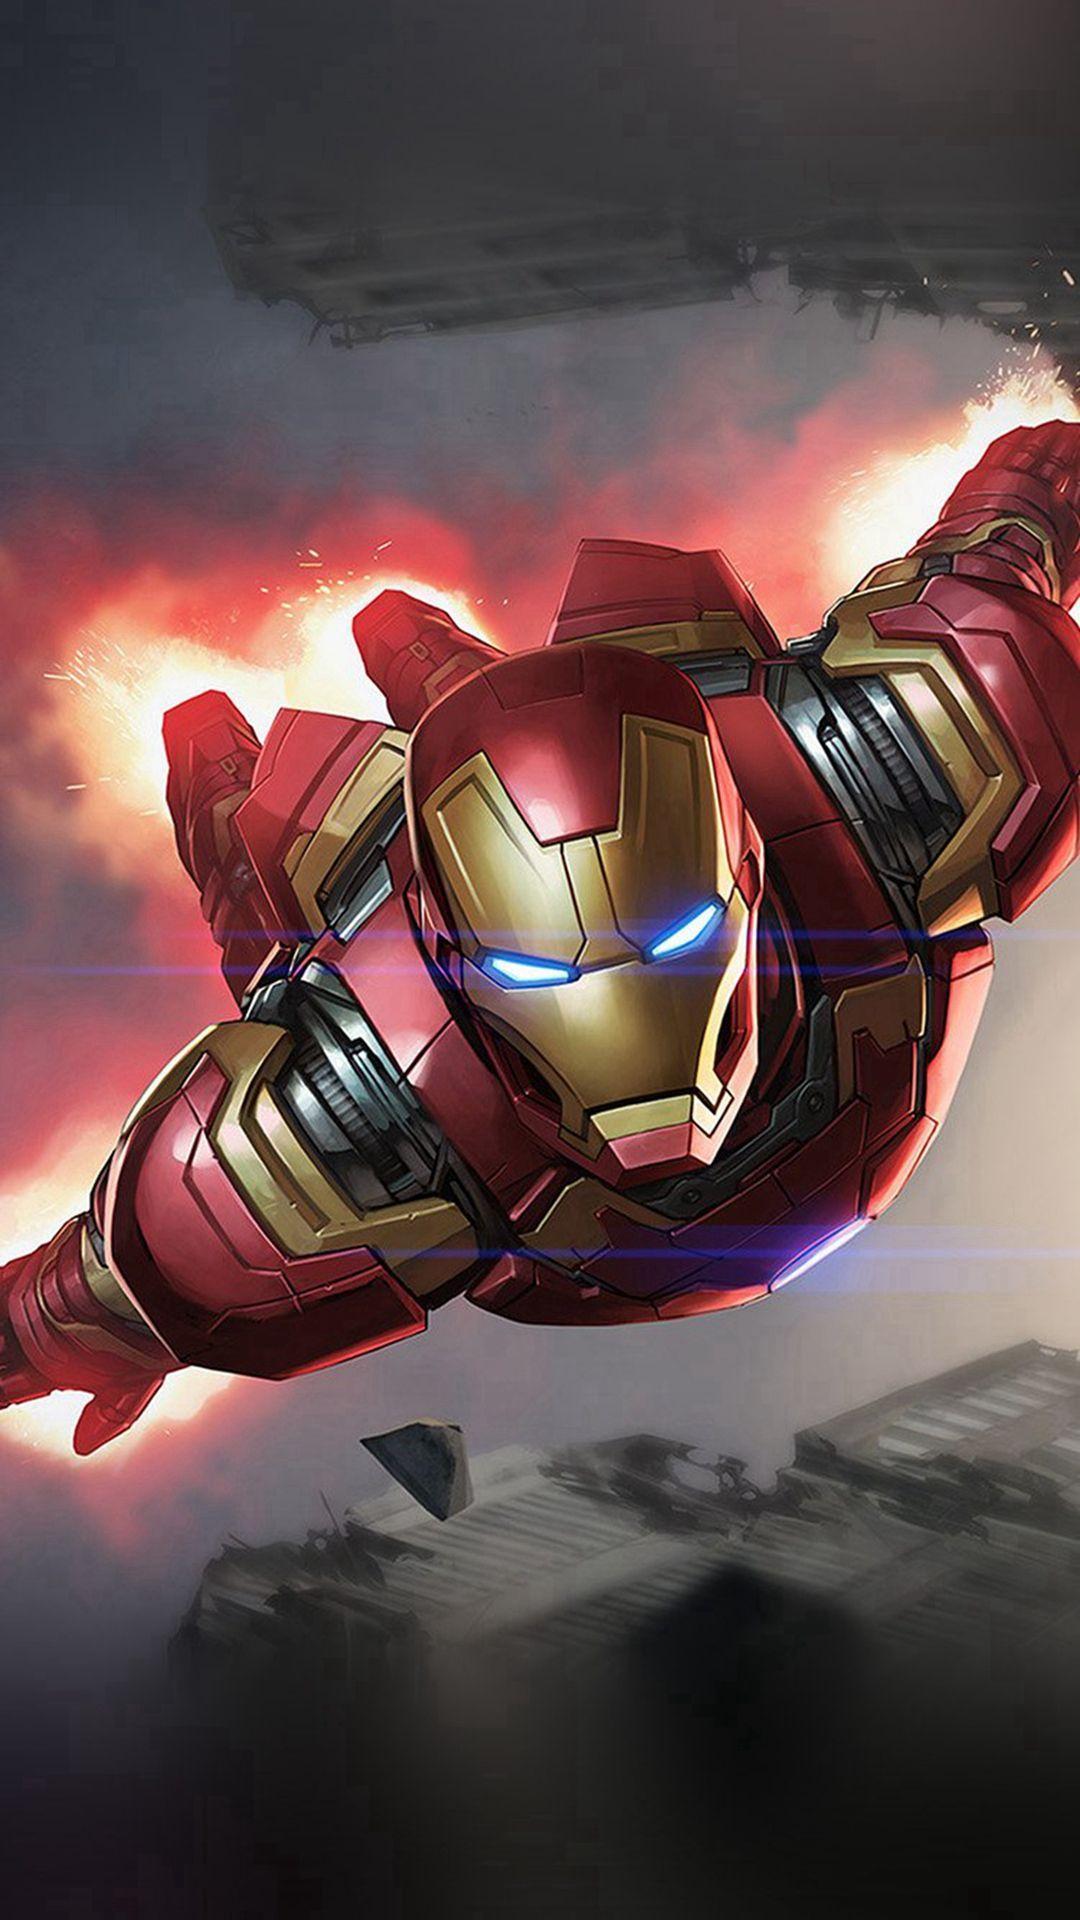 Ironman Hero Marvel Illustration Art iPhone 6 wallpaper